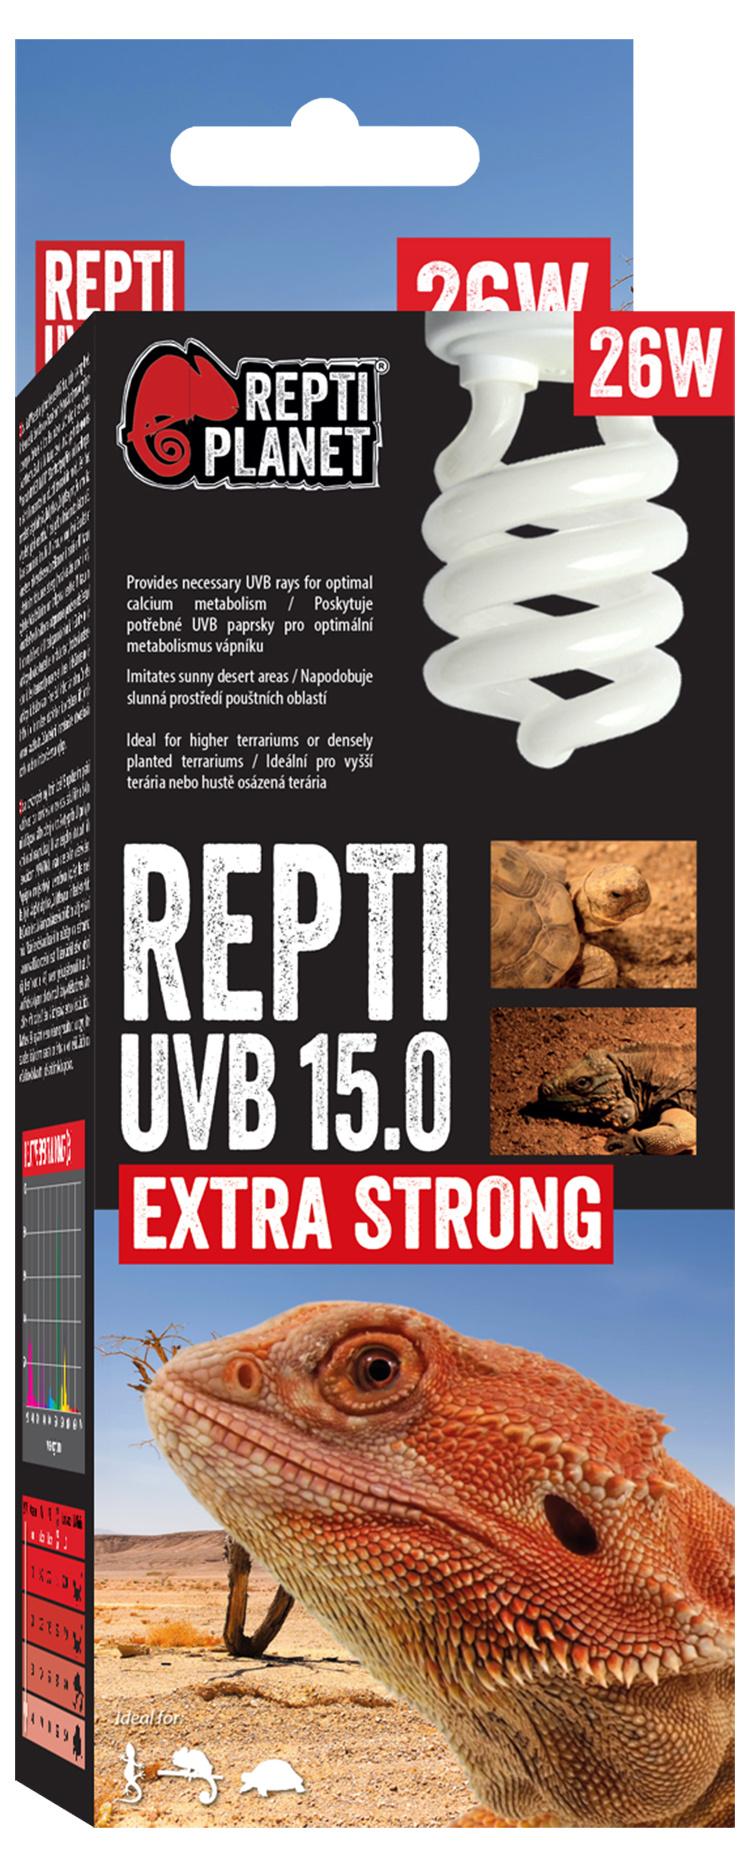 Лампа для террариумов - ReptiPlanet Repti UVB 15.0, 26W